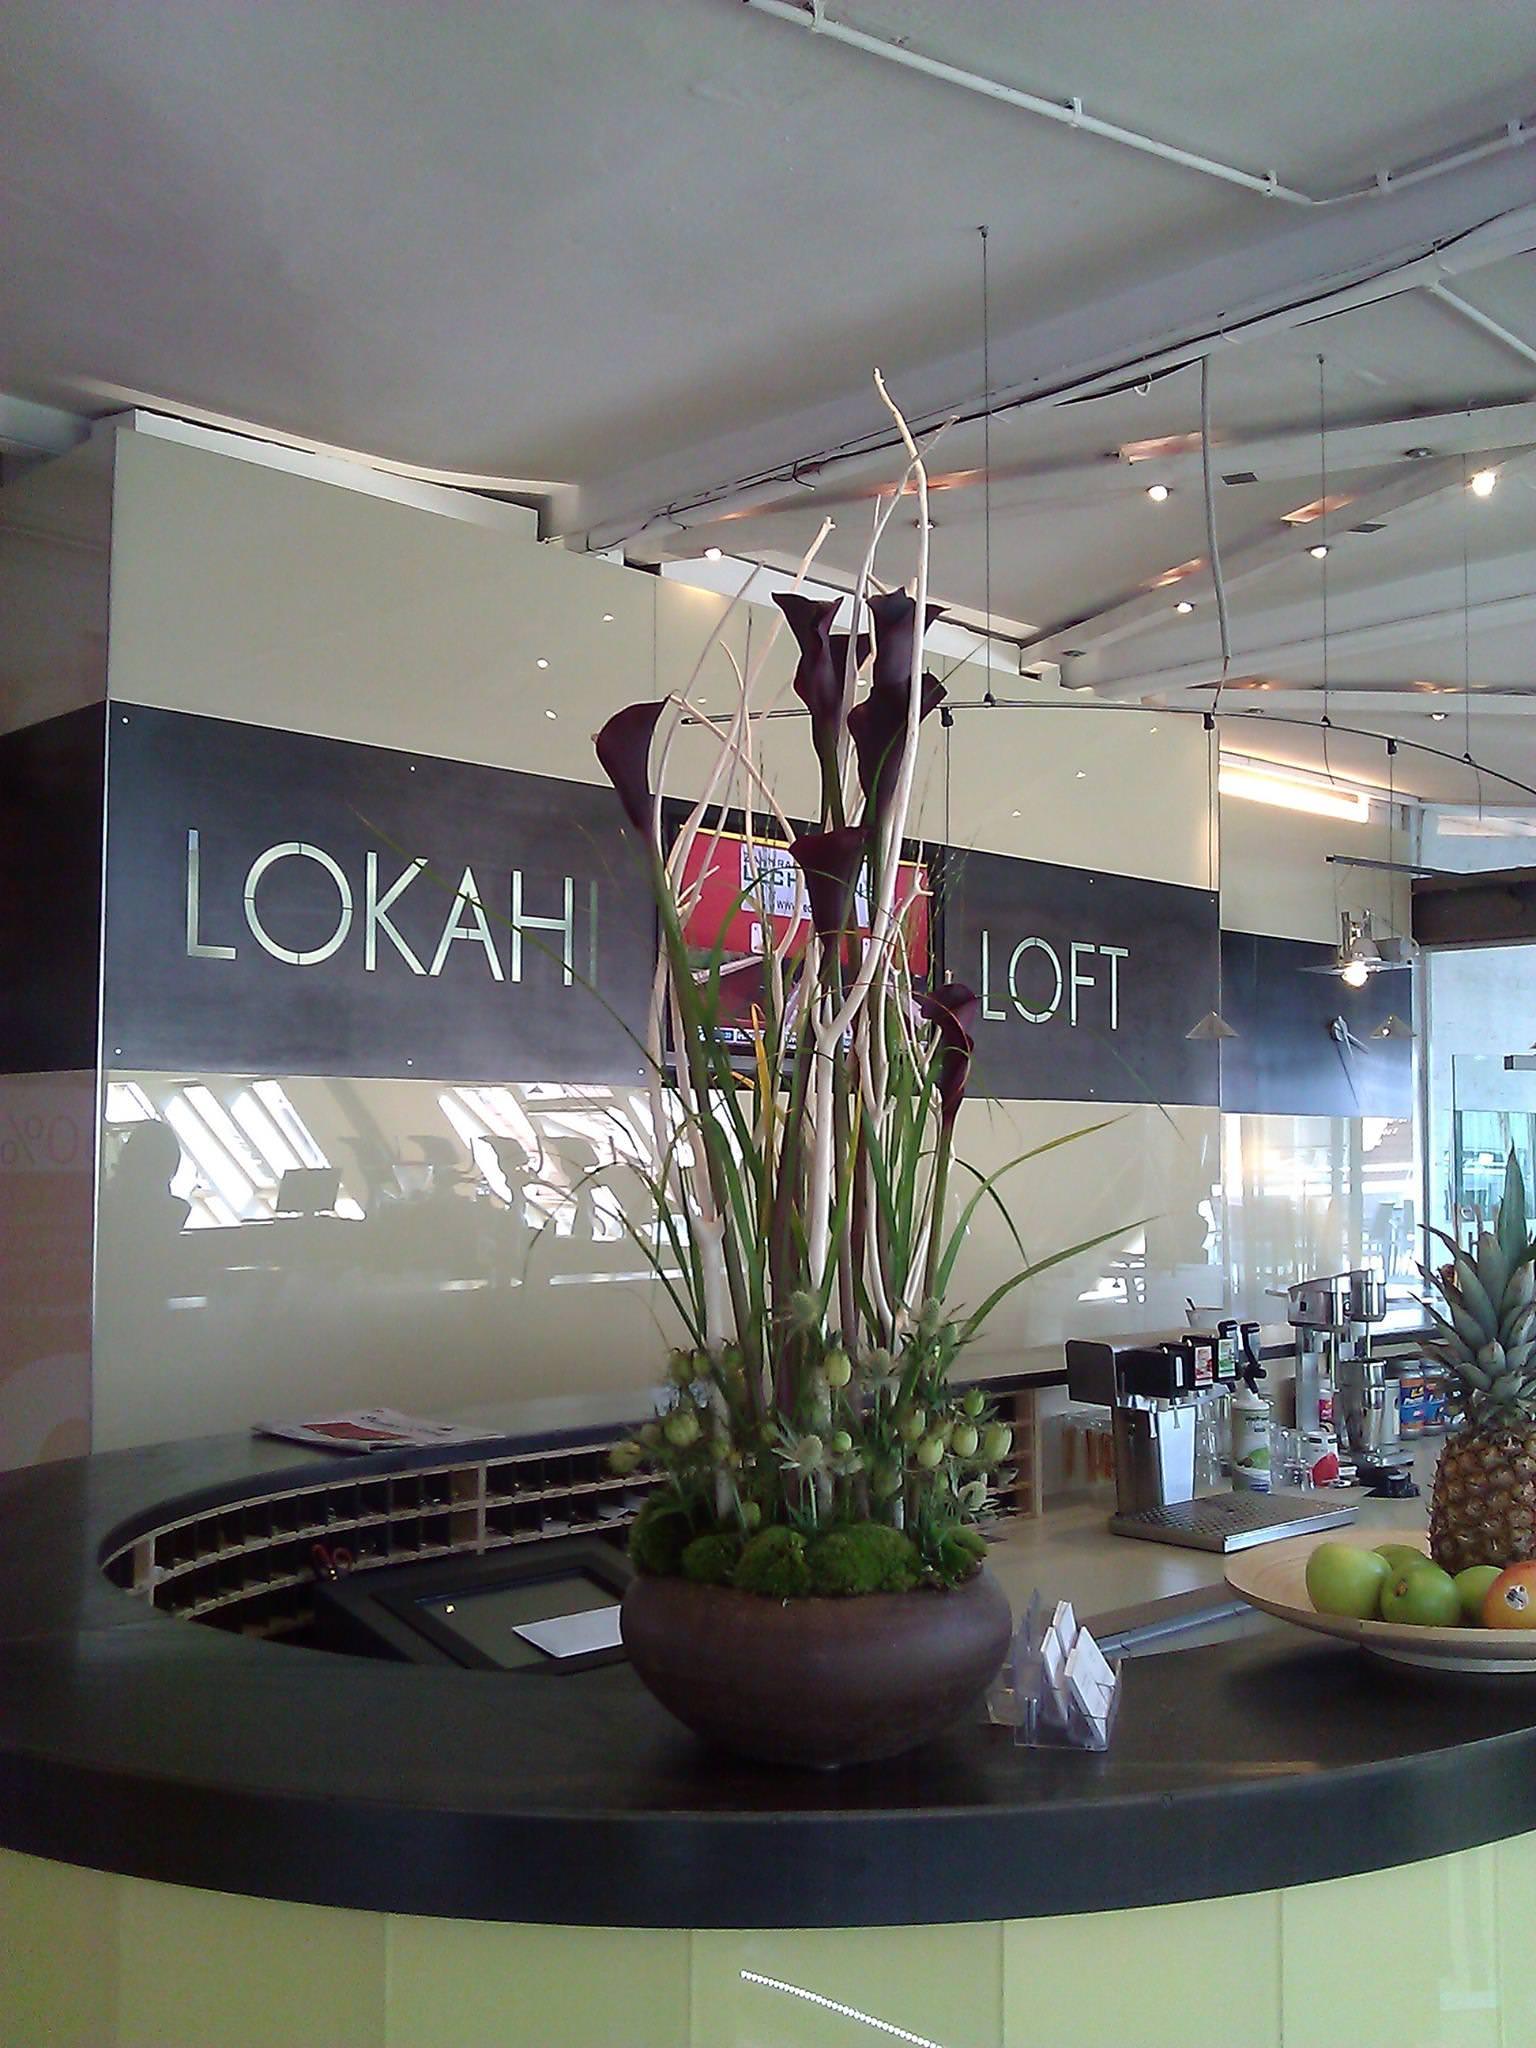 lokahi loft ist body life club des jahres 2008 sports insider magazin. Black Bedroom Furniture Sets. Home Design Ideas